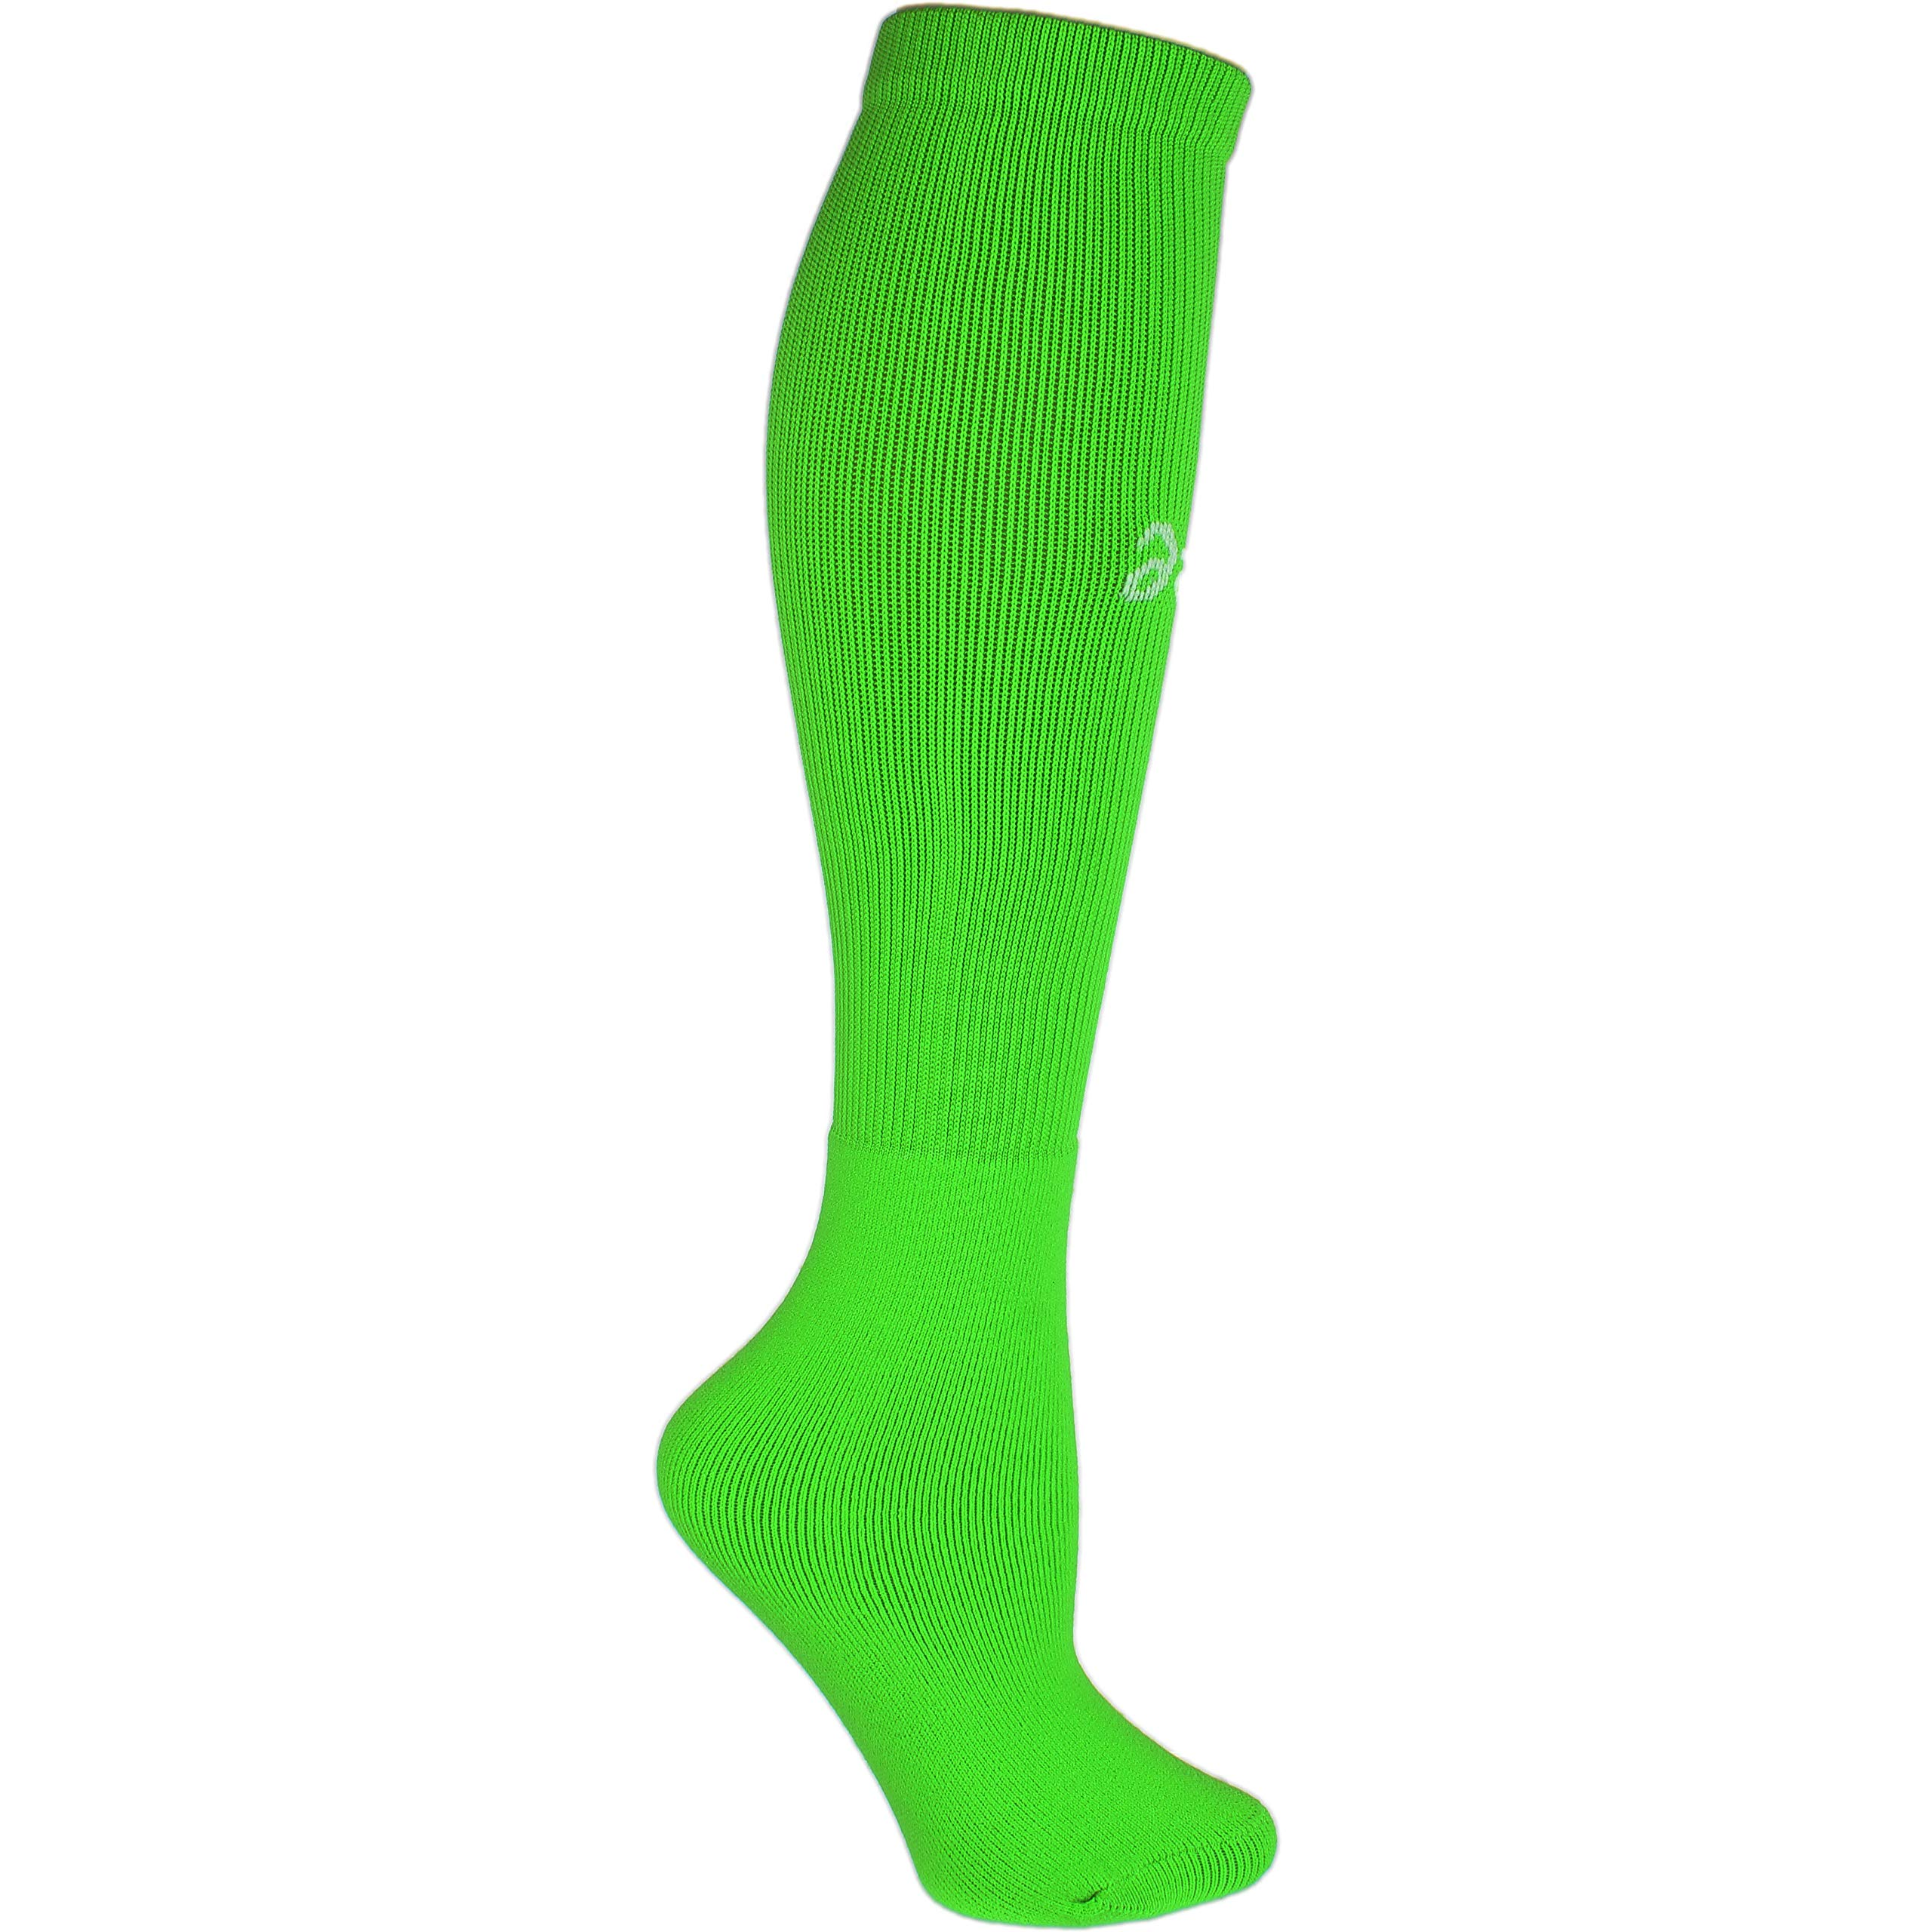 ASICS All Sport Court Sock, Neon Green, Medium by ASICS